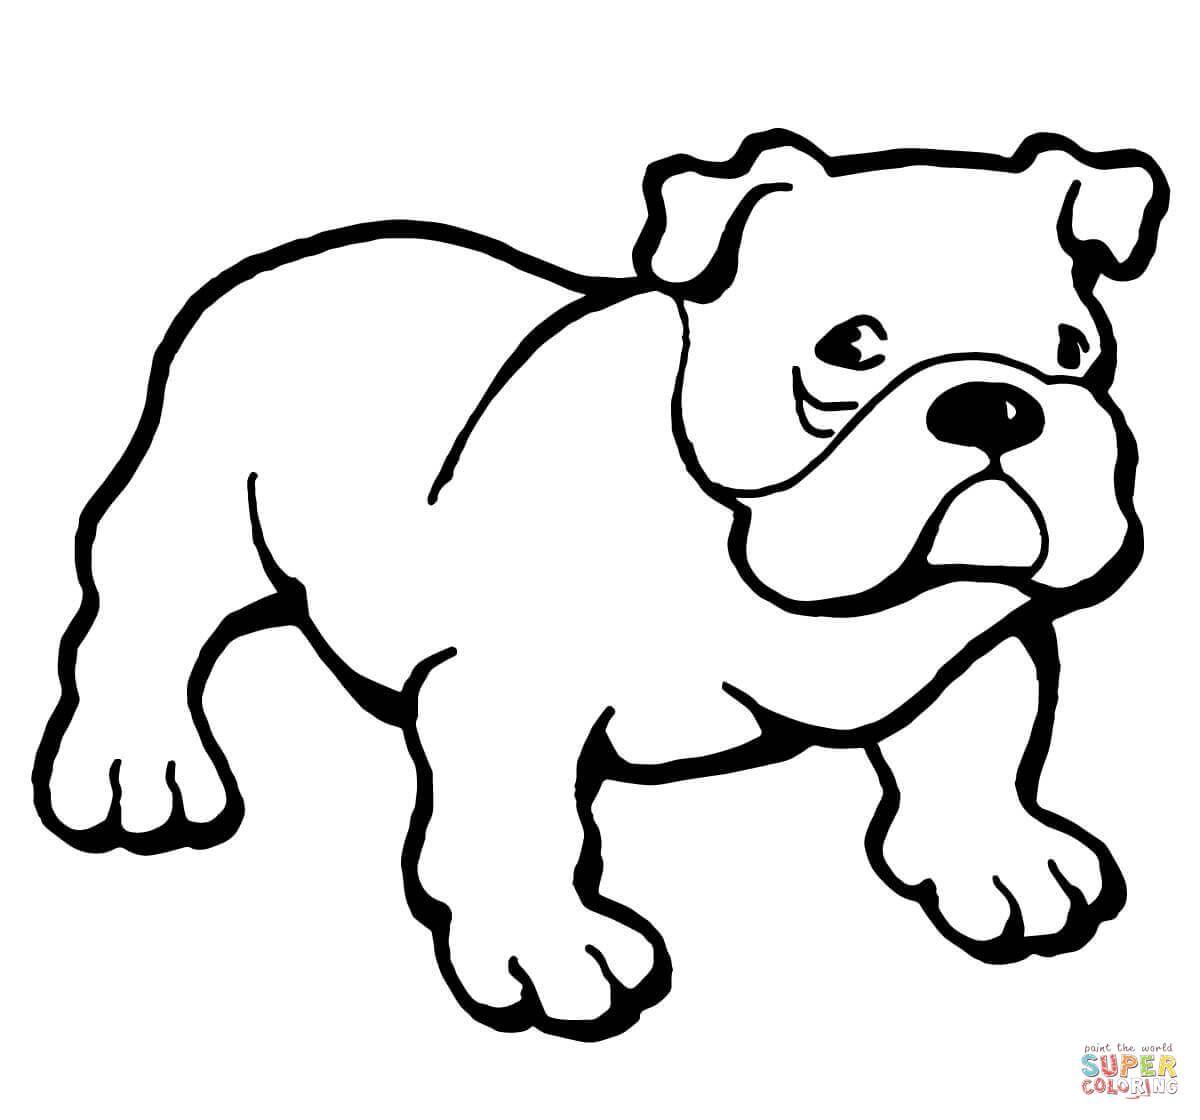 30 Idea Cane Da Colorare Bulldog Dog Coloring Page Puppy Coloring Pages Animal Coloring Books